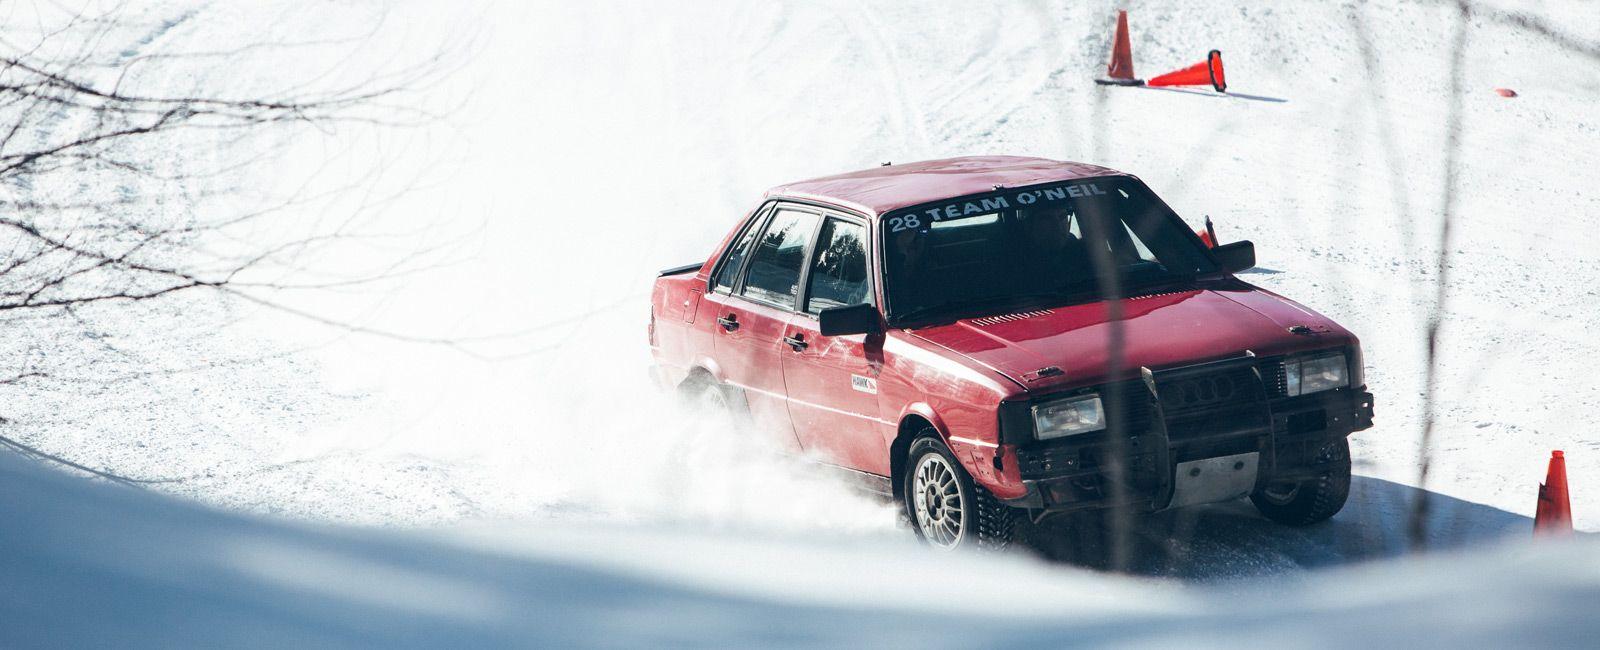 Rally-School-Audi-1600-Gear-Patrol